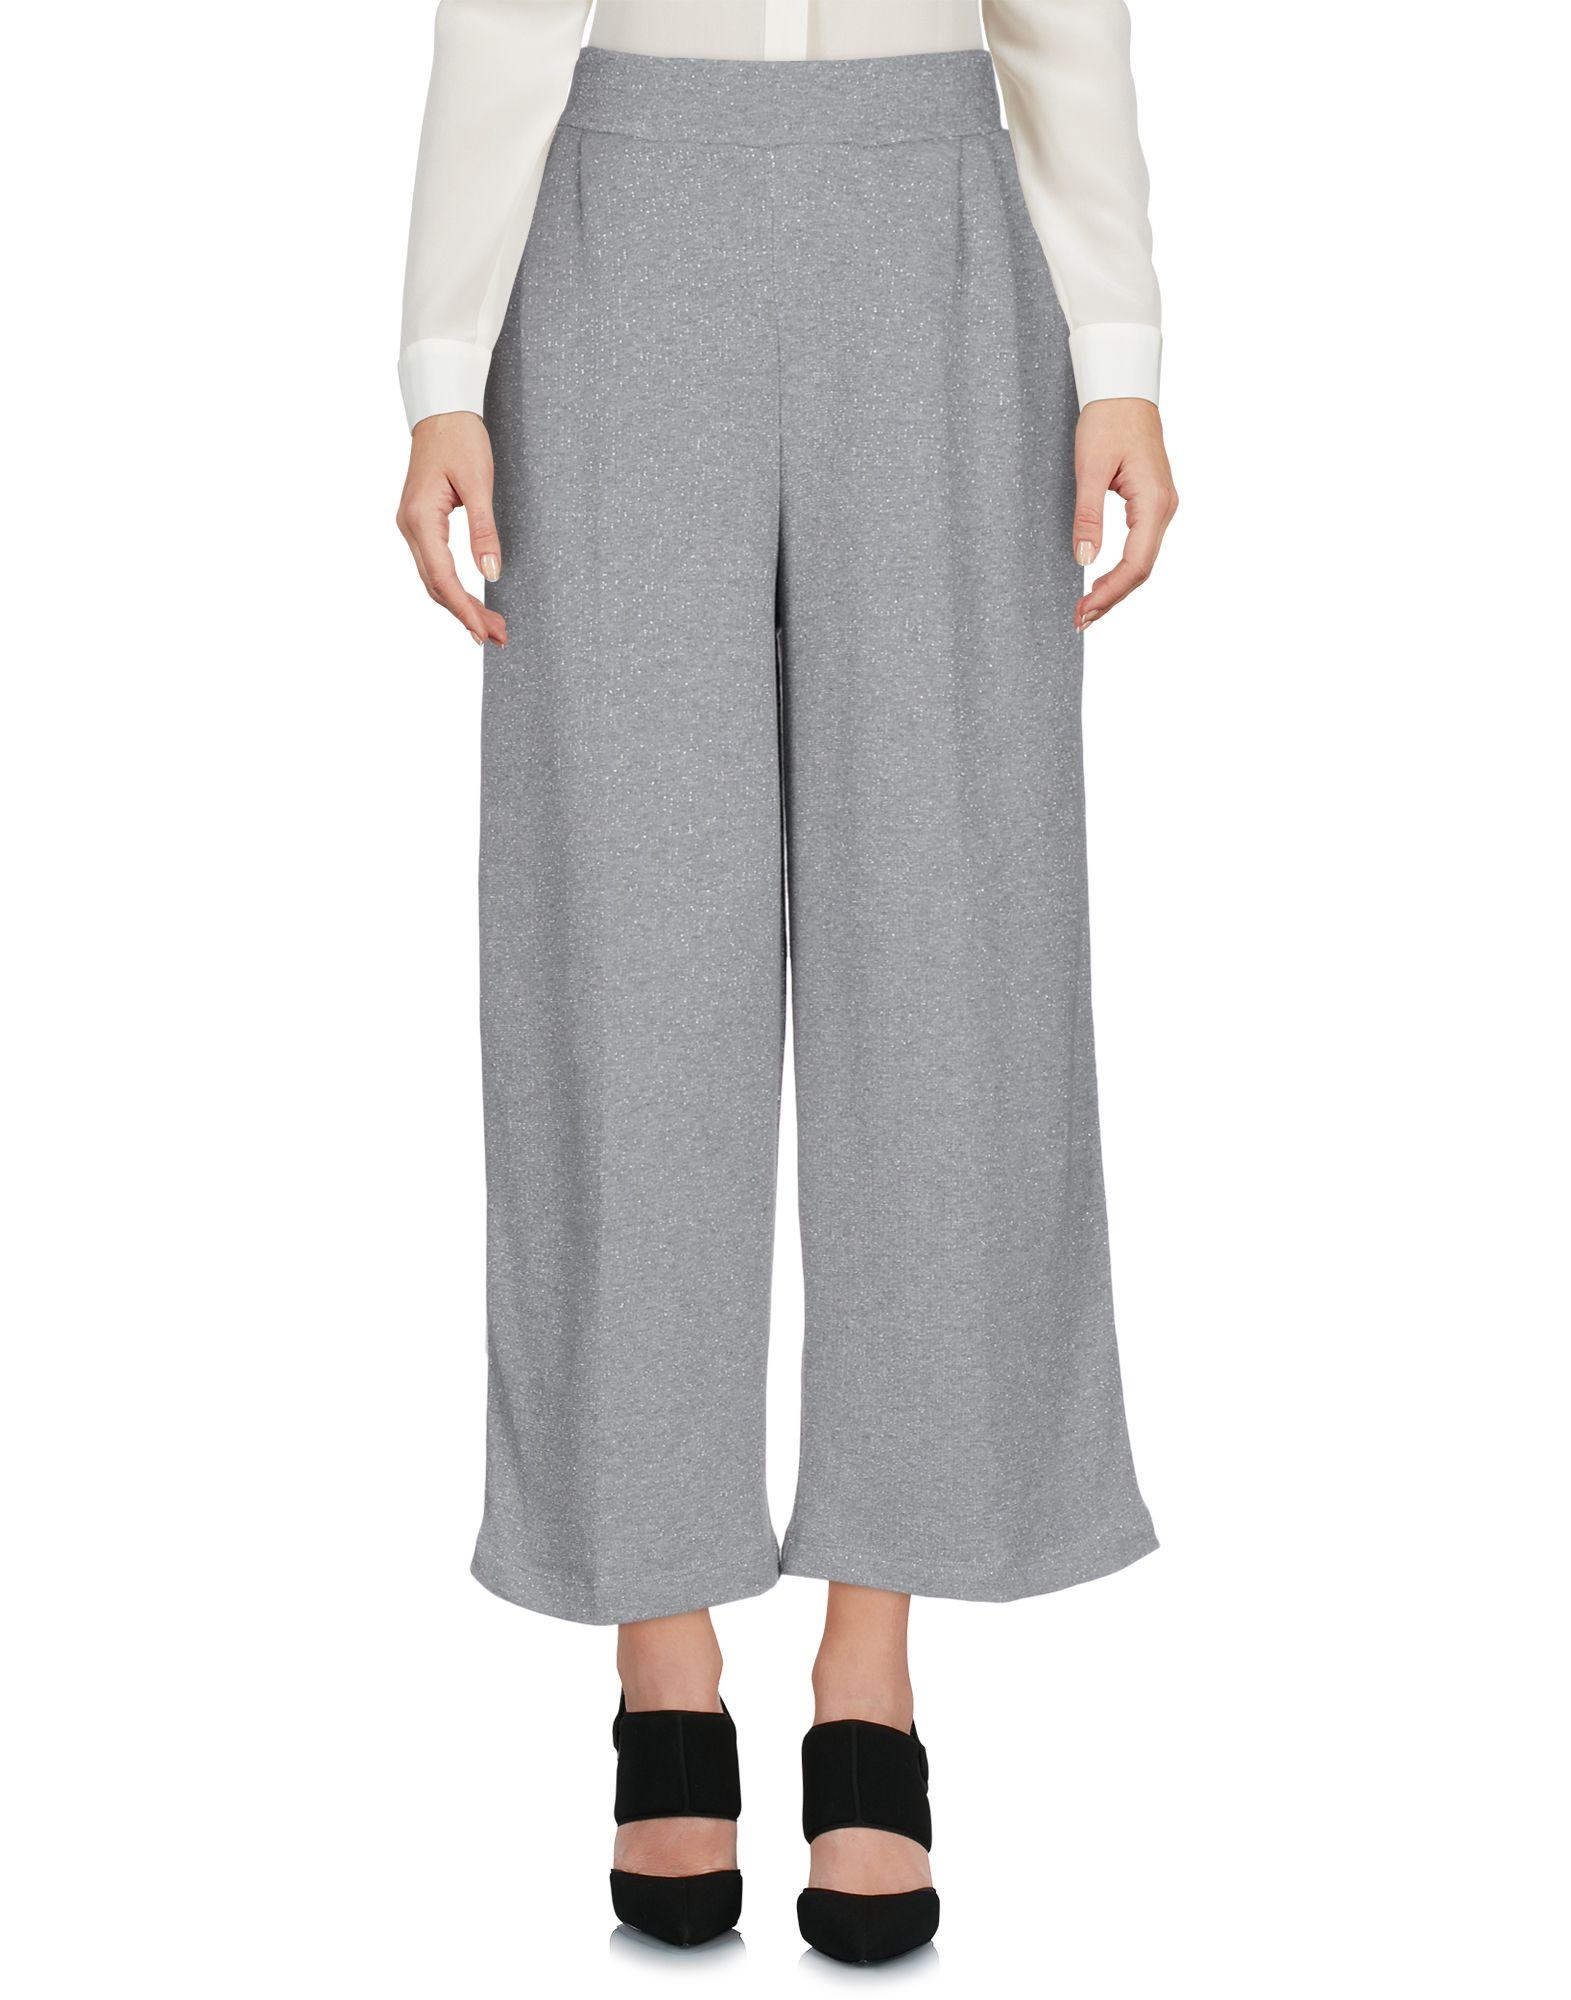 JIJIL Cropped Pants & Culottes in Grey